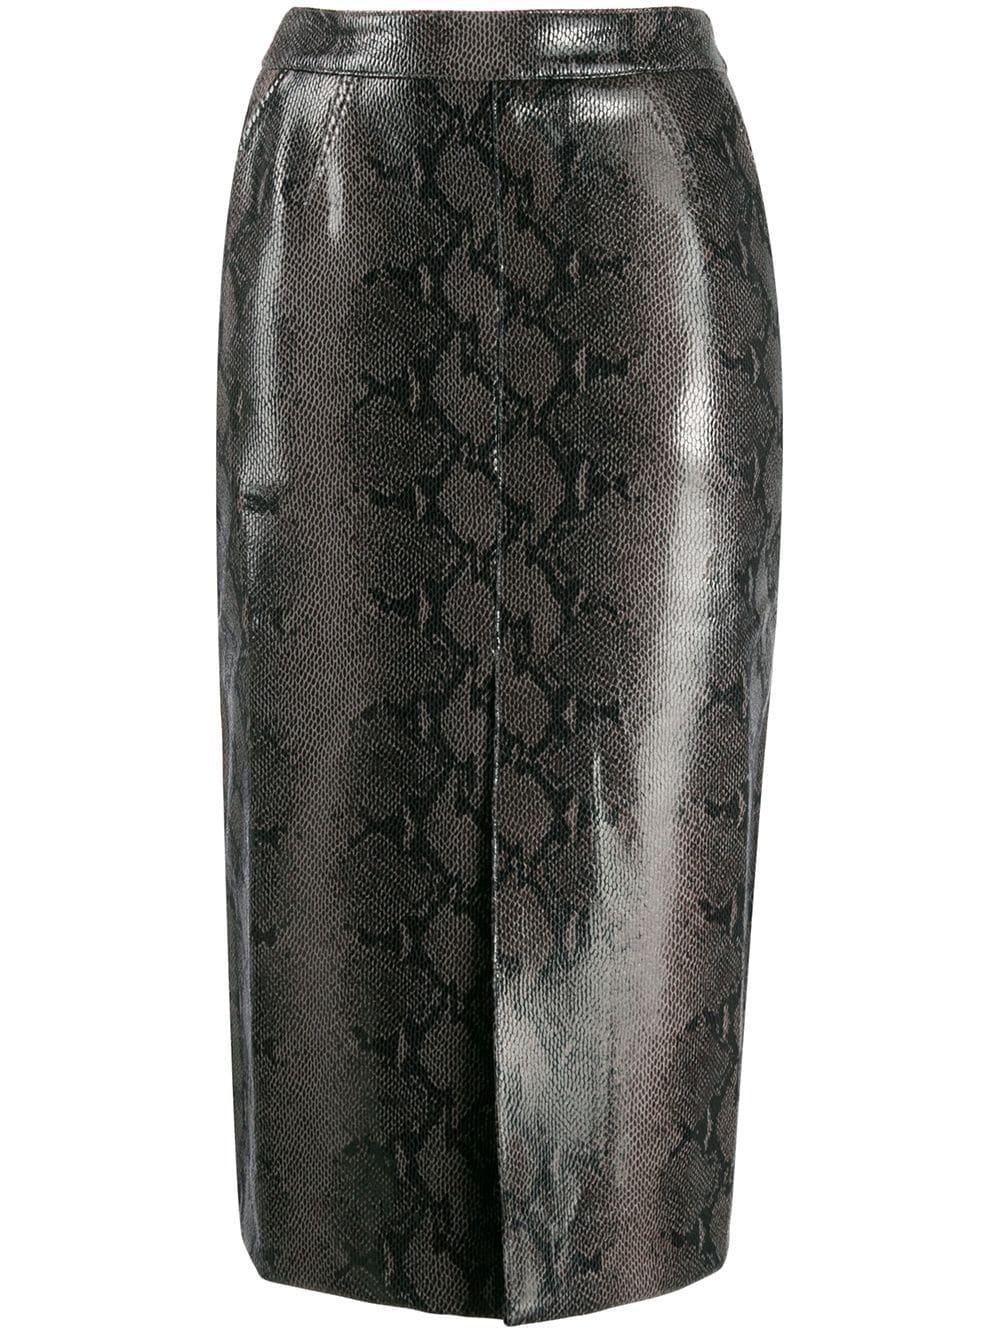 Essentiel Antwerp юбка-карандаш с тиснением под змеиную кожу